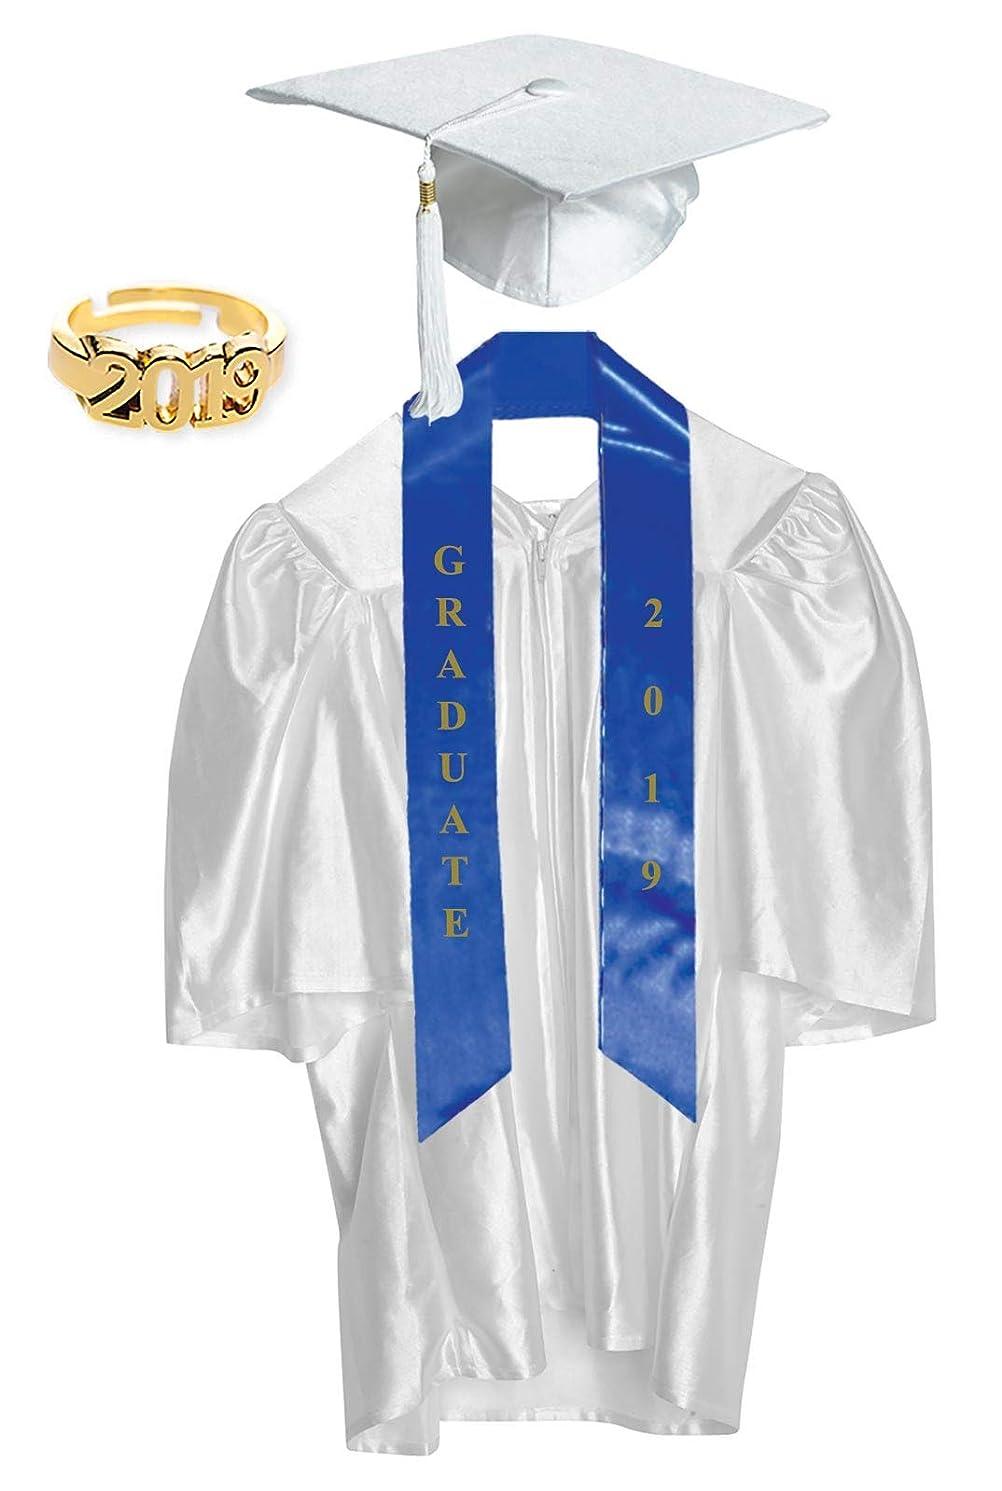 Preschool & Kindergarten Graduation Cap and Gown with Tassel, Sash, Ring and Certificate